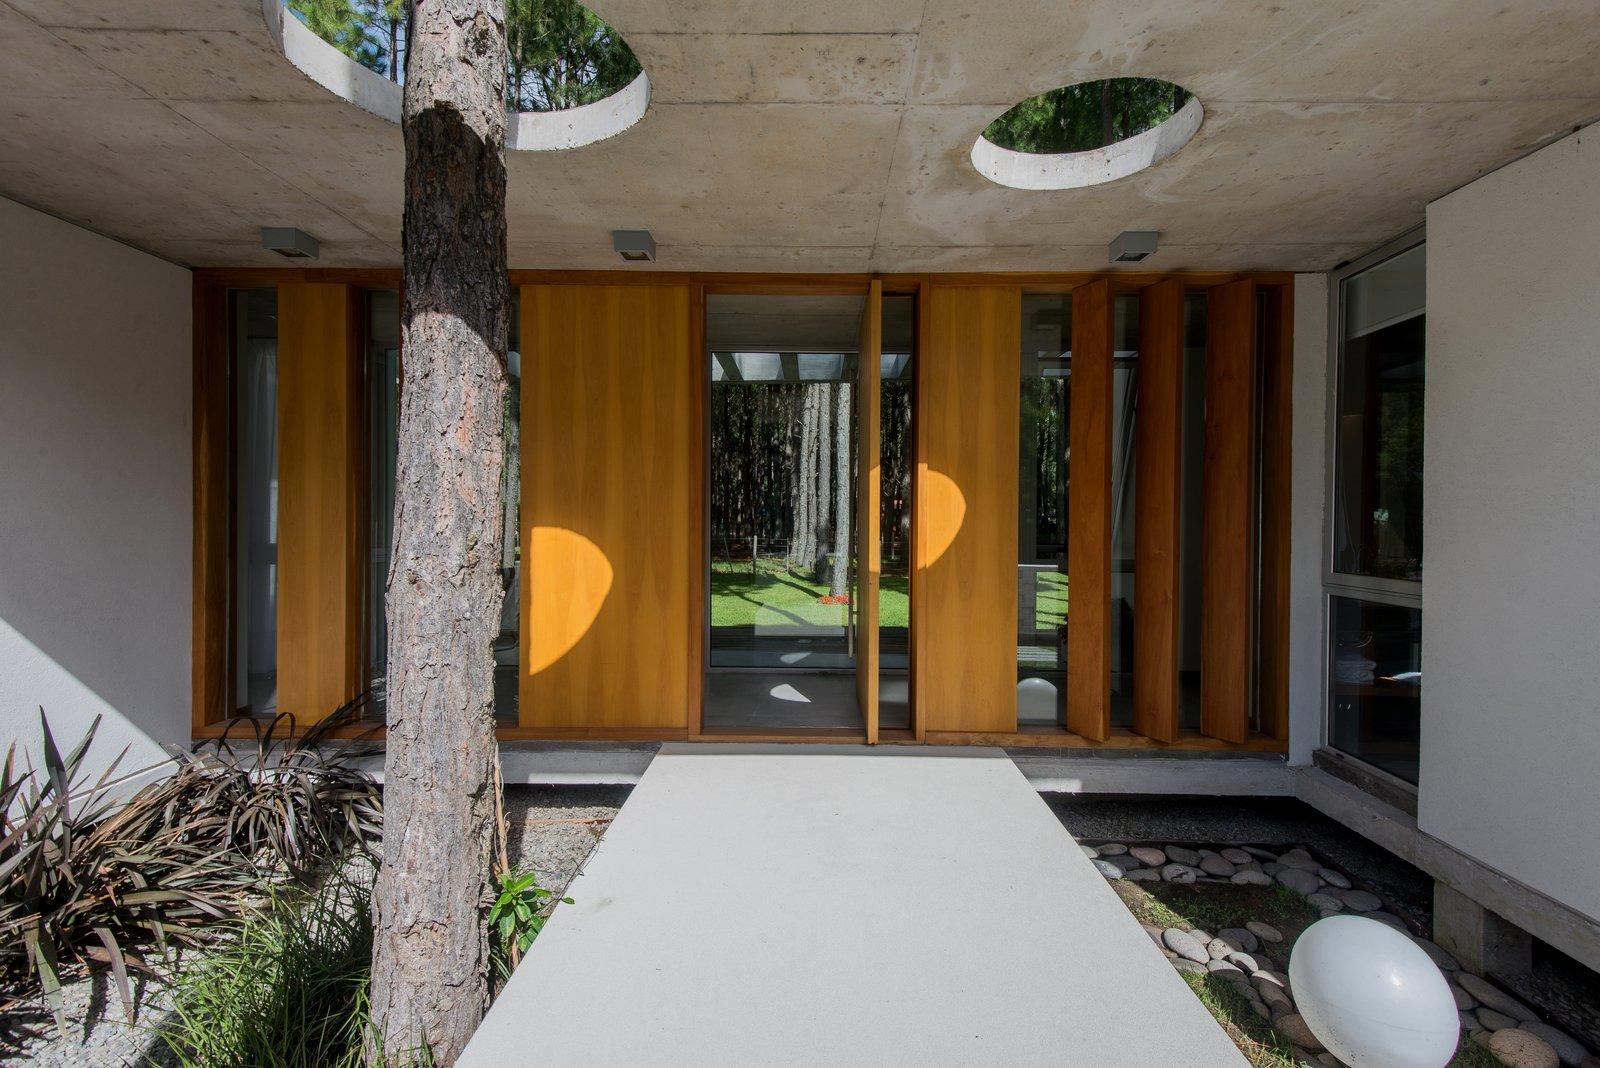 Tagged: Outdoor, Front Yard, Trees, Wood Patio, Porch, Deck, Concrete Patio, Porch, Deck, and Stone Patio, Porch, Deck.  Casa Batin by Estudio Galera